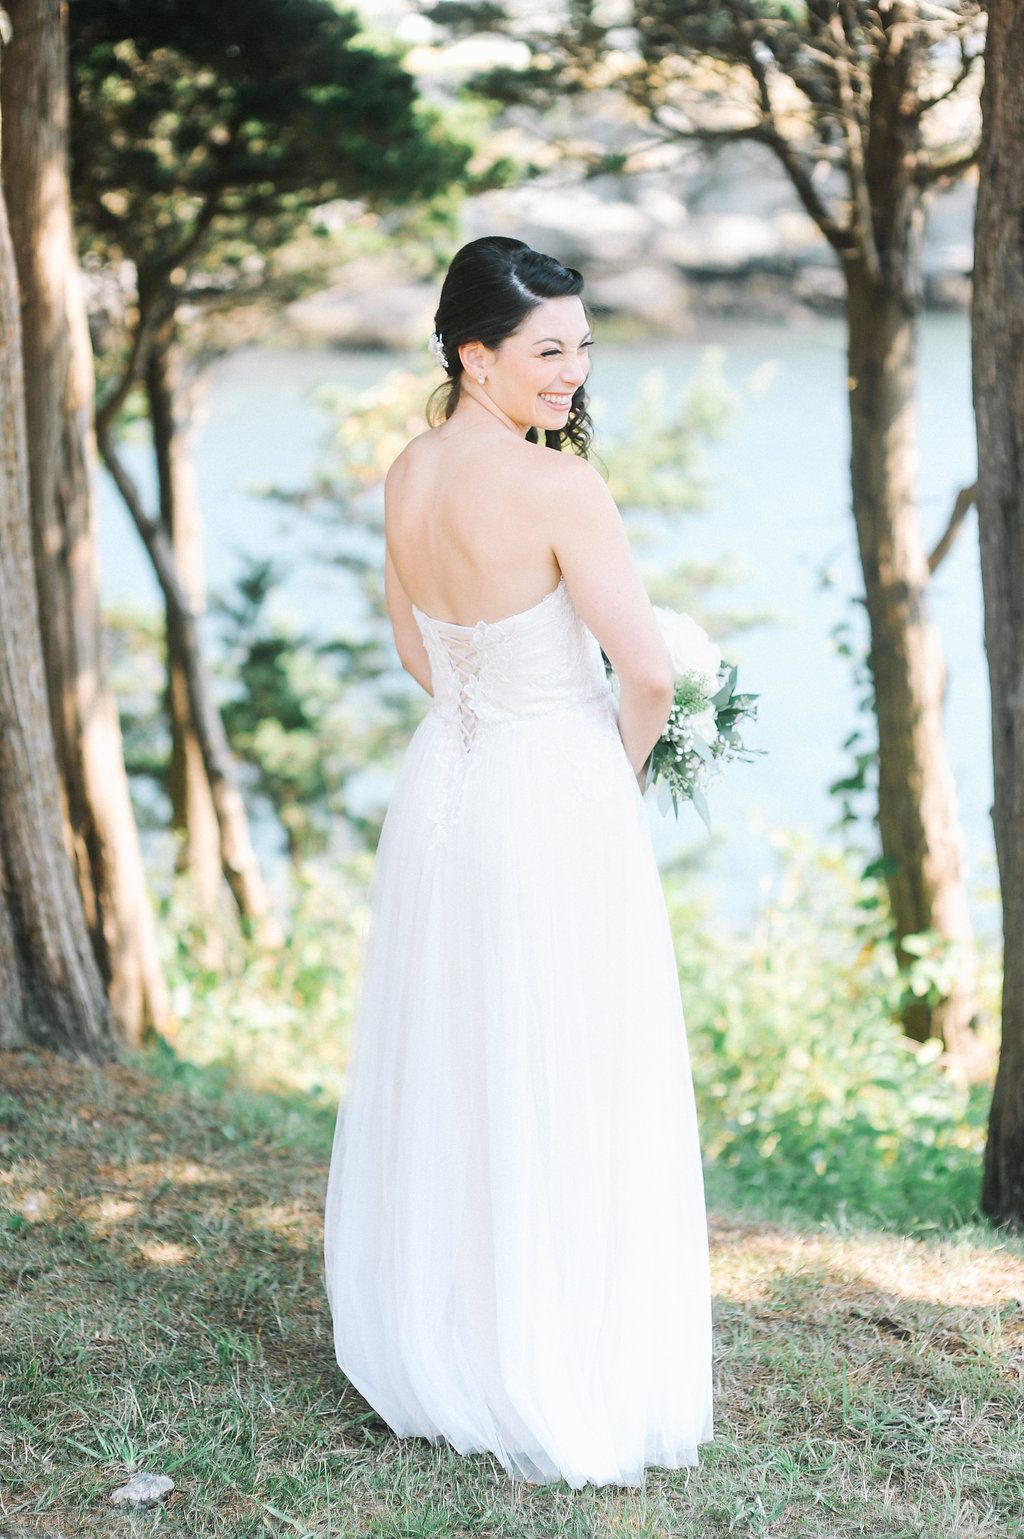 BrideGroomPortraits_Dragonline_Studios_Jamestown_RI_Wedding-52.jpg